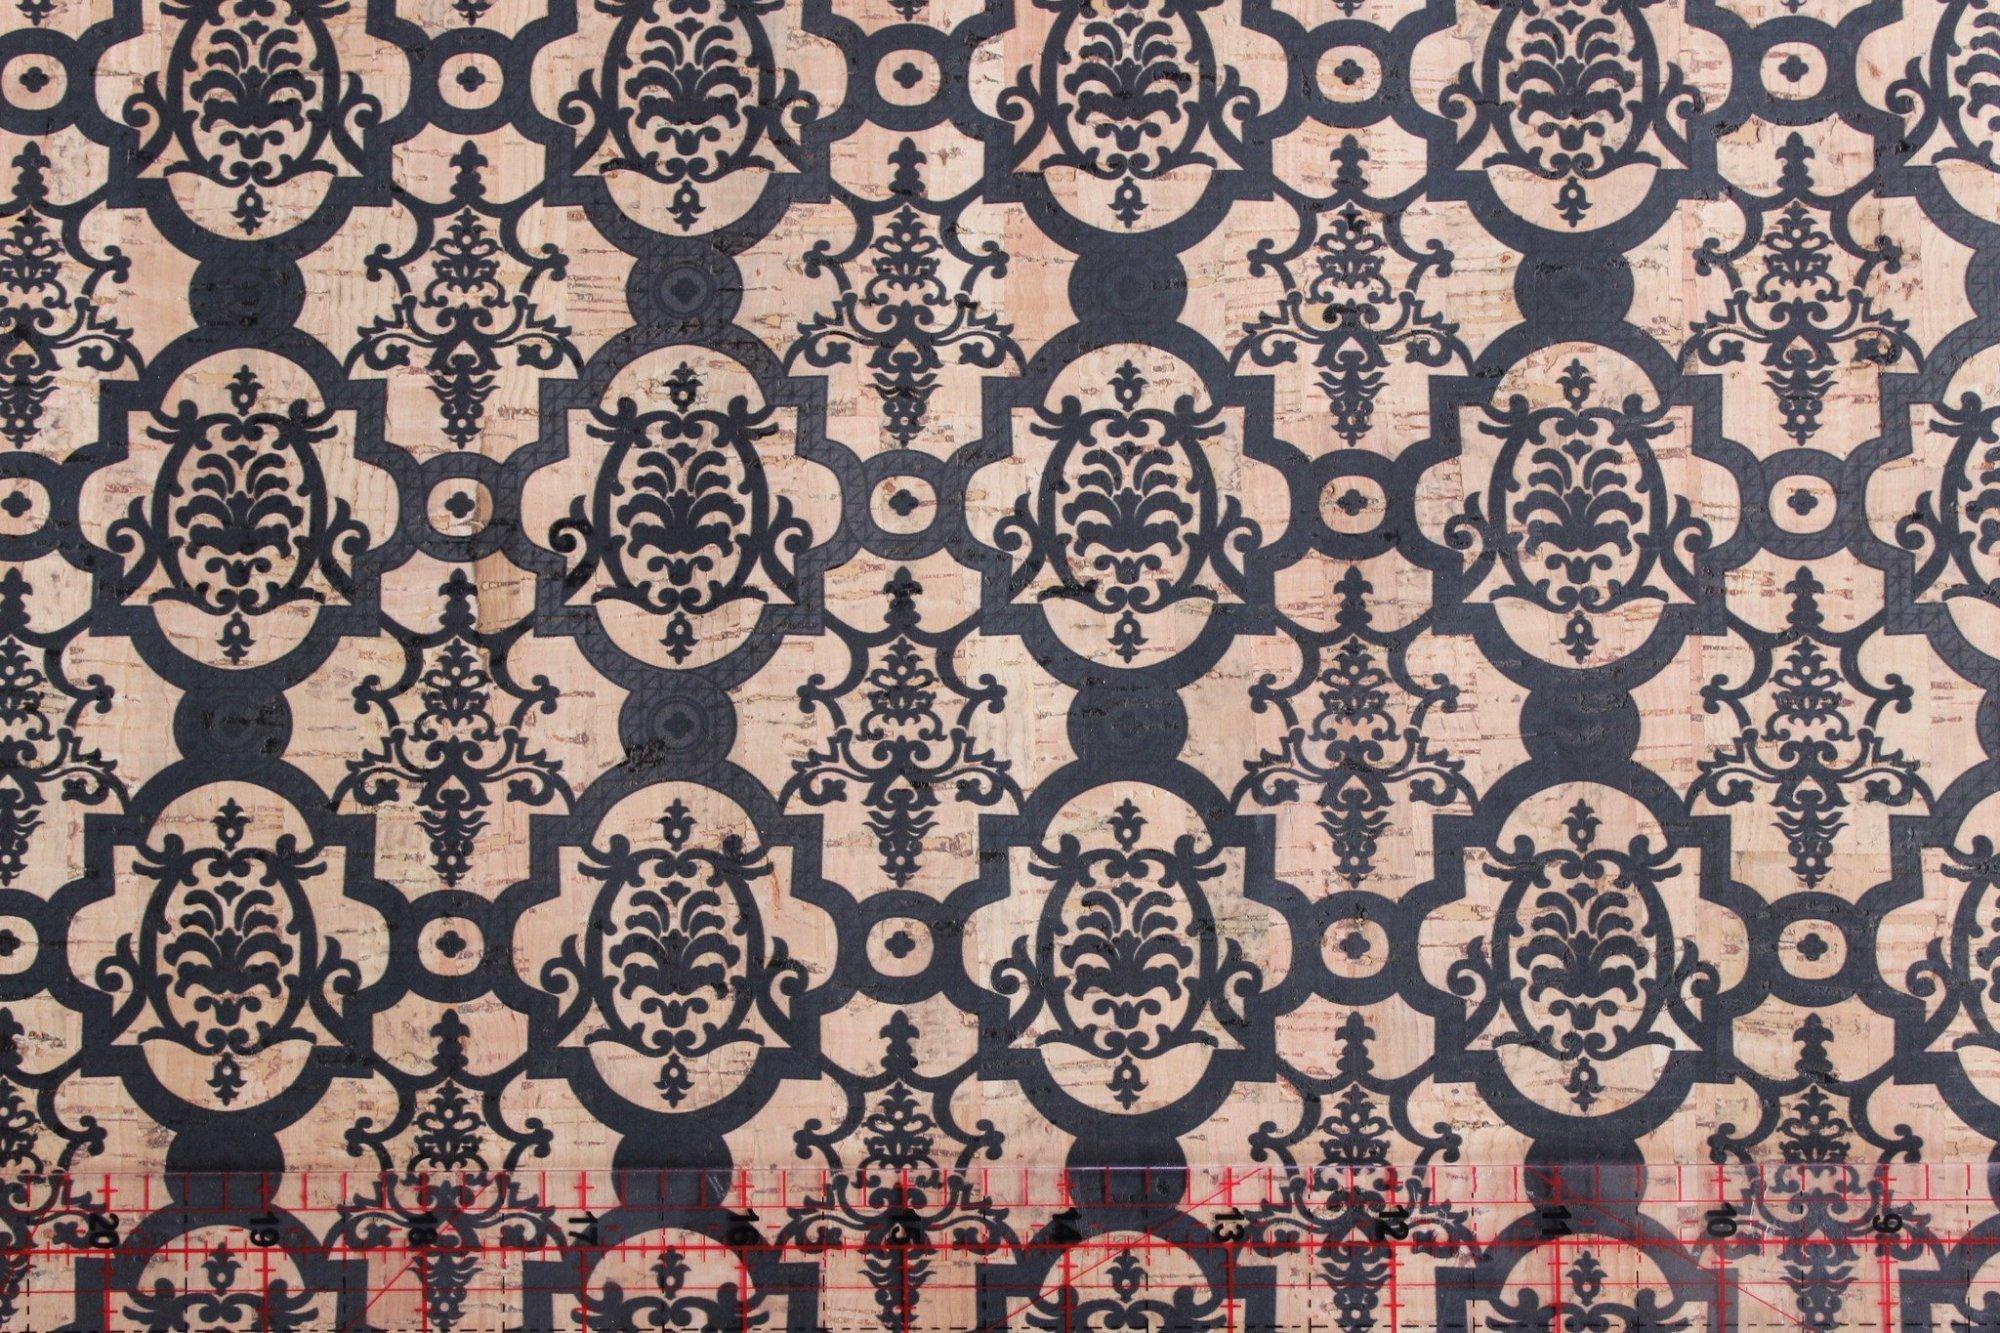 Printed Turtle Damask Cork Fabric (18x36)